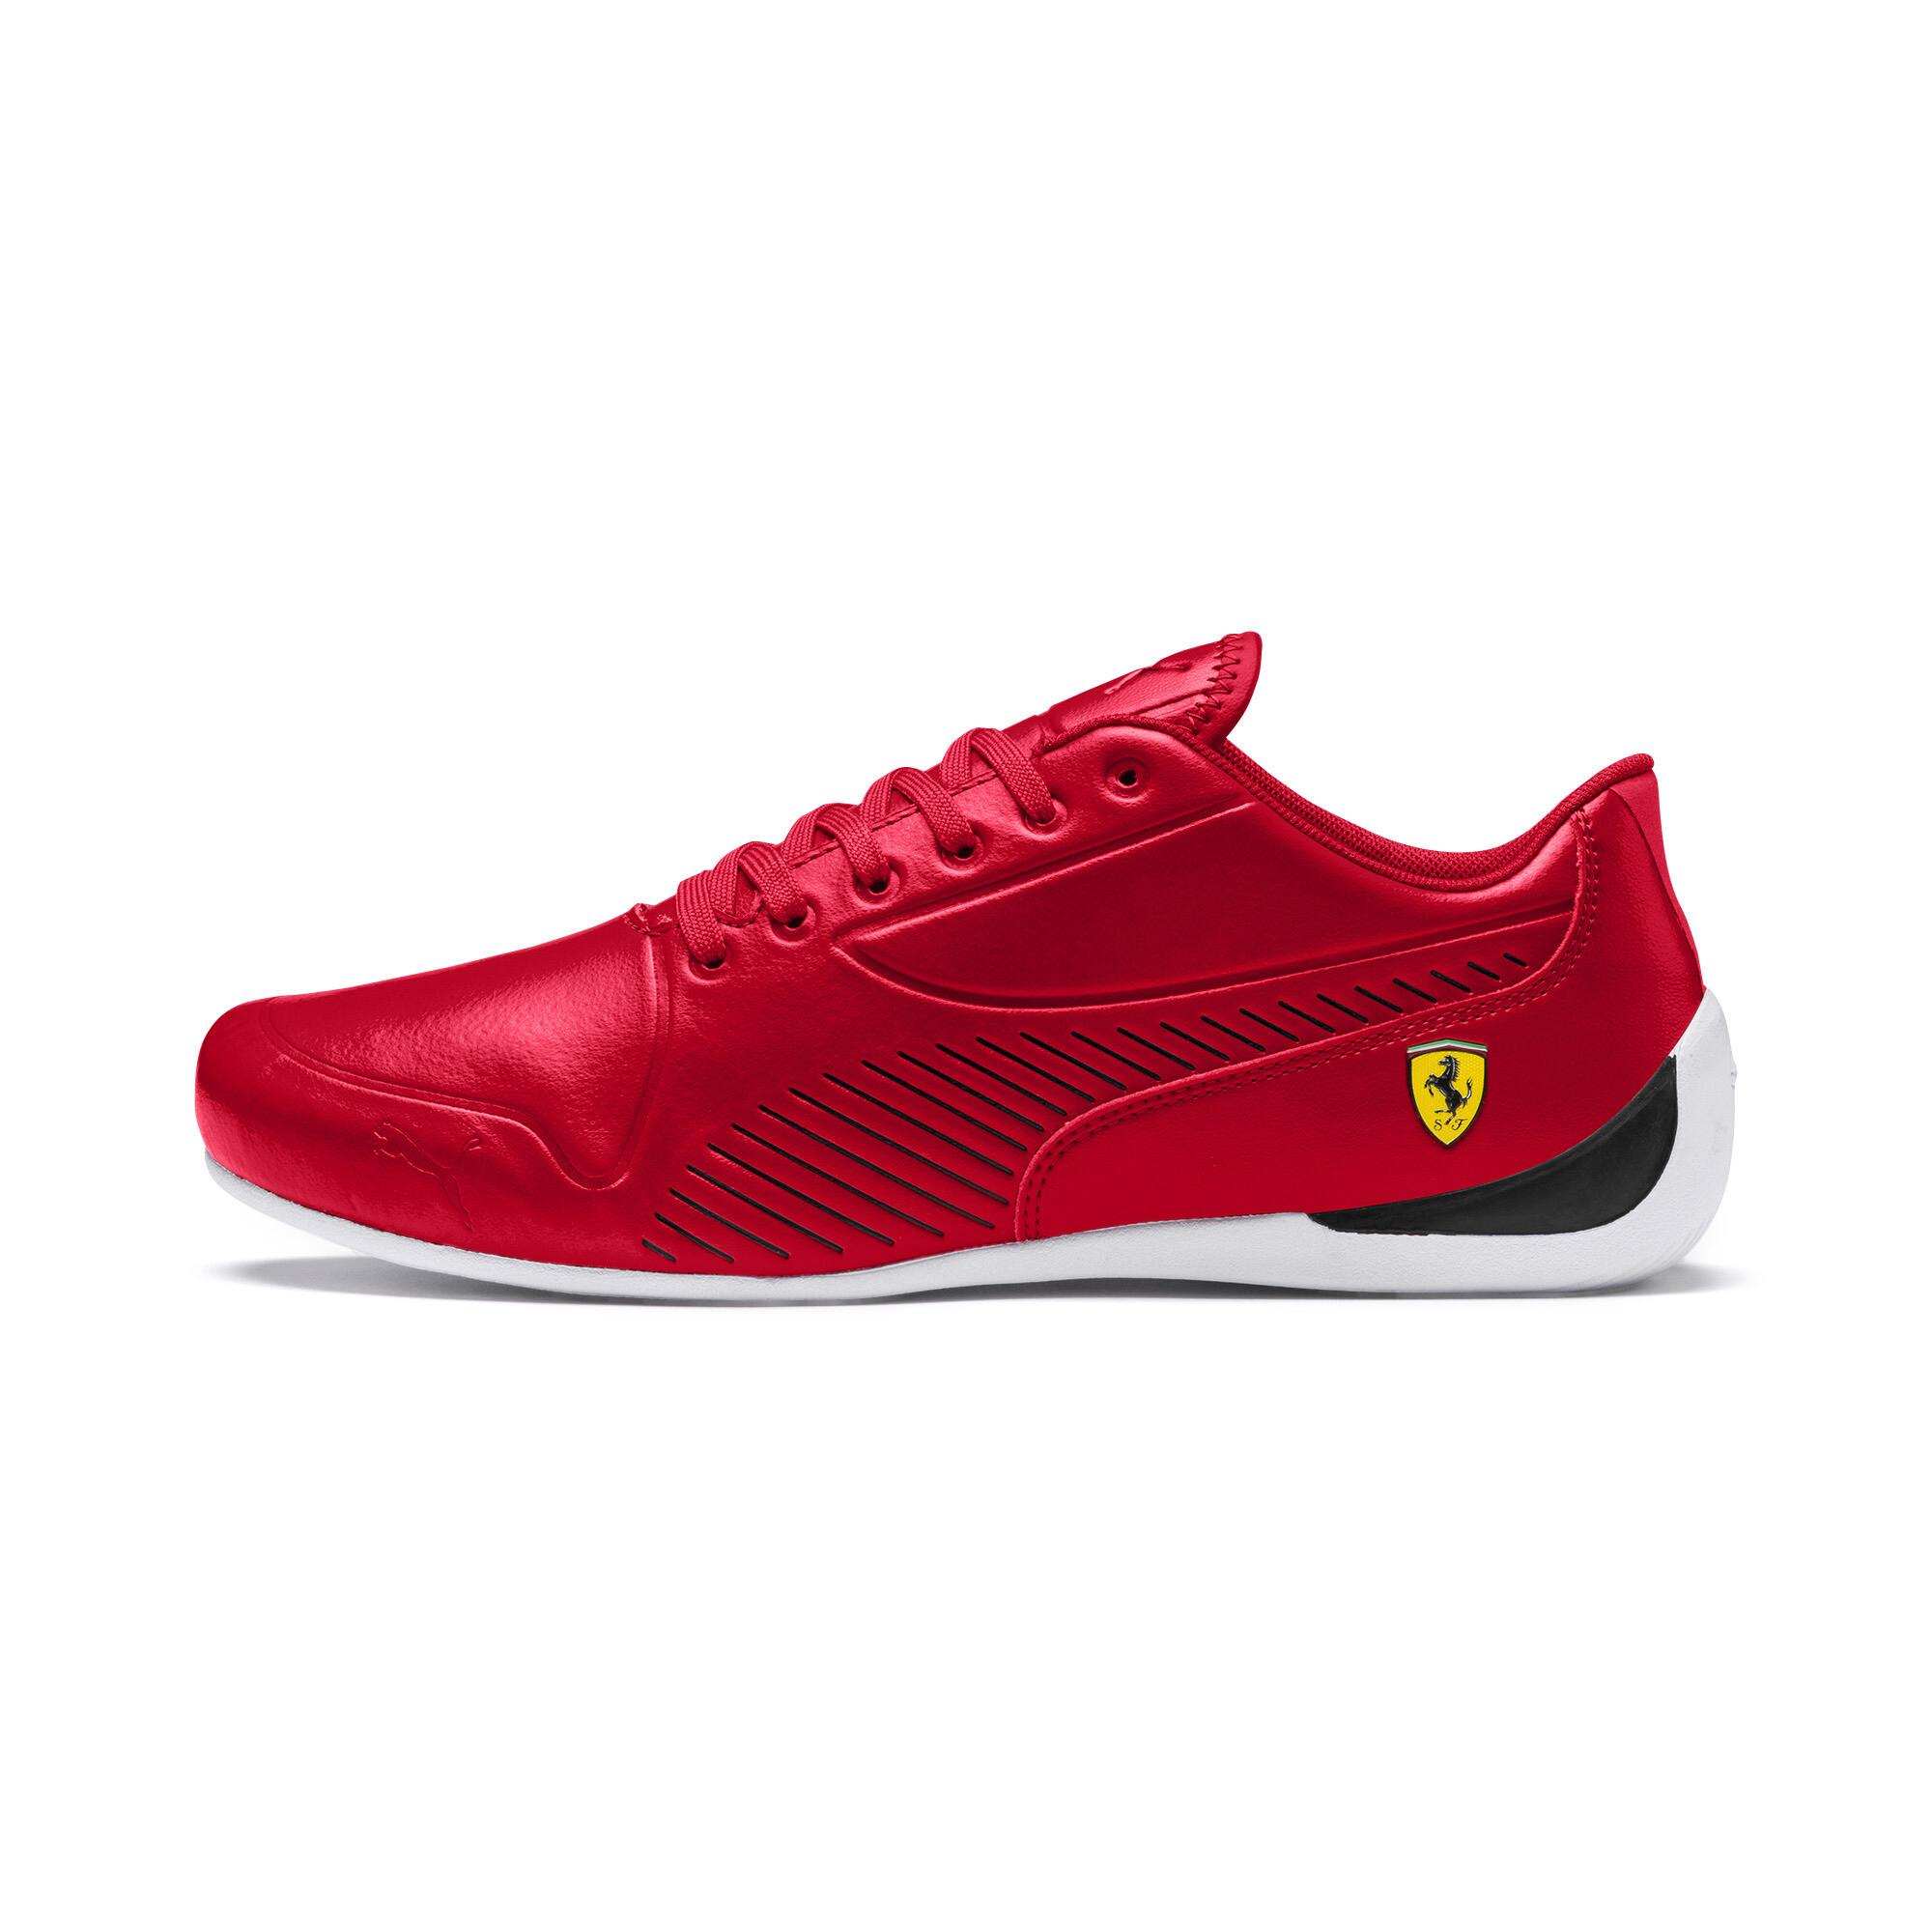 PUMA-Scuderia-Ferrari-Drift-Cat-7S-Ultra-Men-039-s-Shoes-Men-Shoe-Auto thumbnail 10